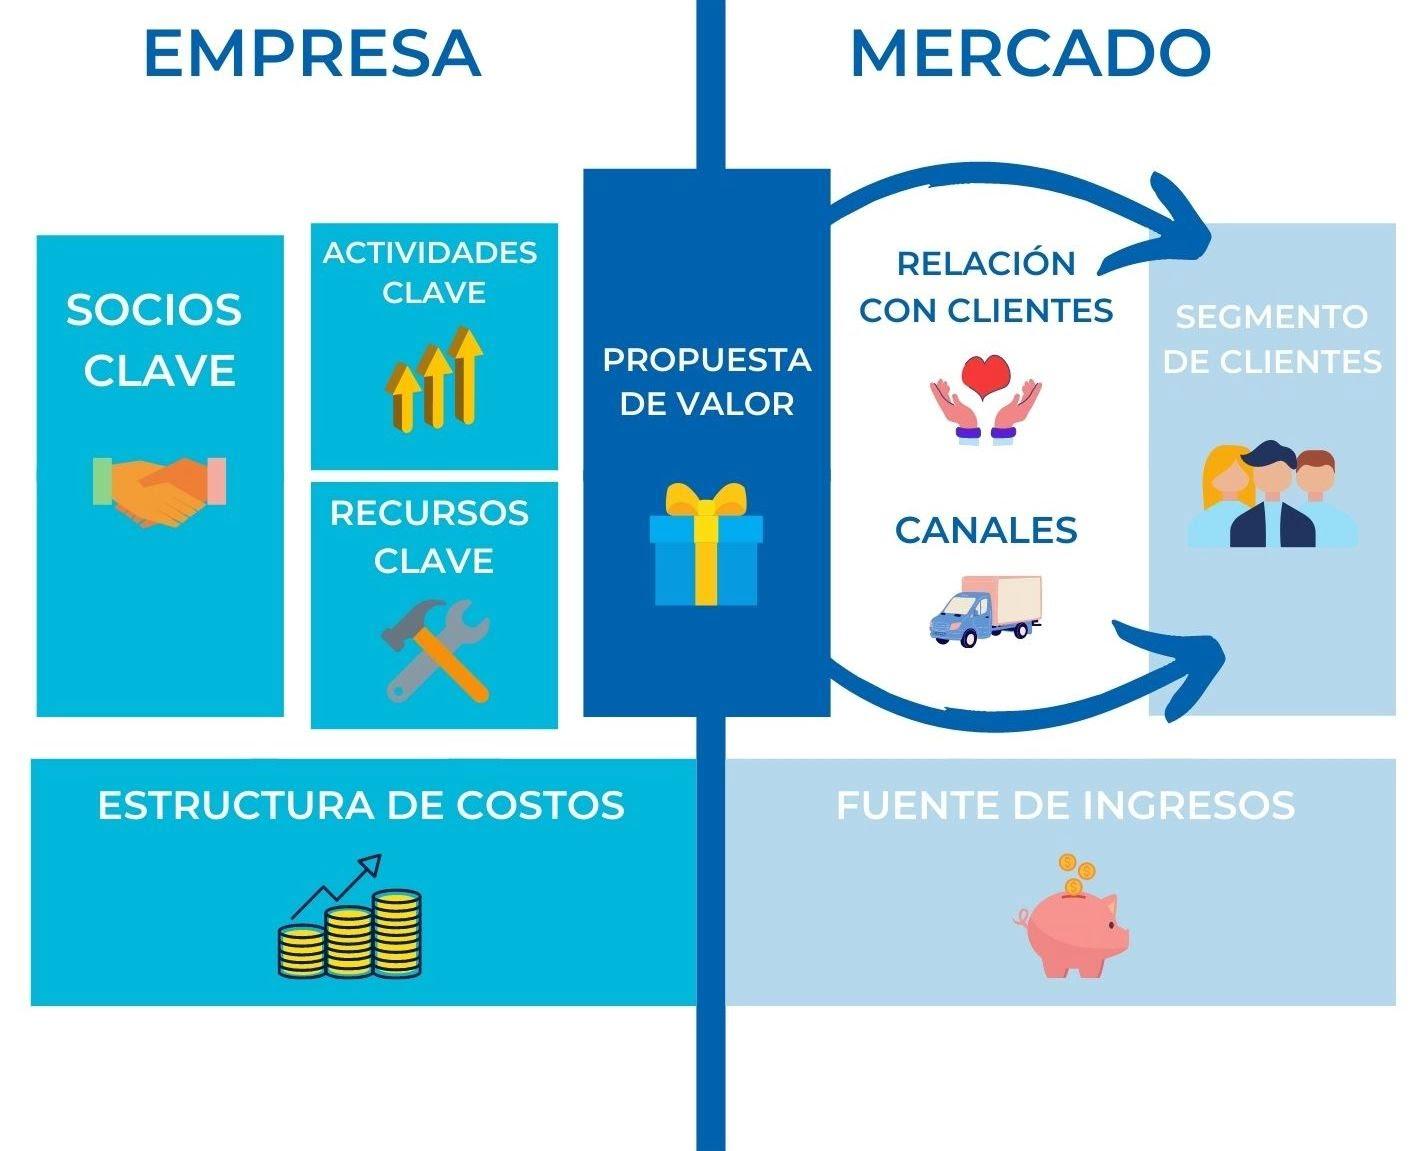 business-model-canvas-empresa-mercado